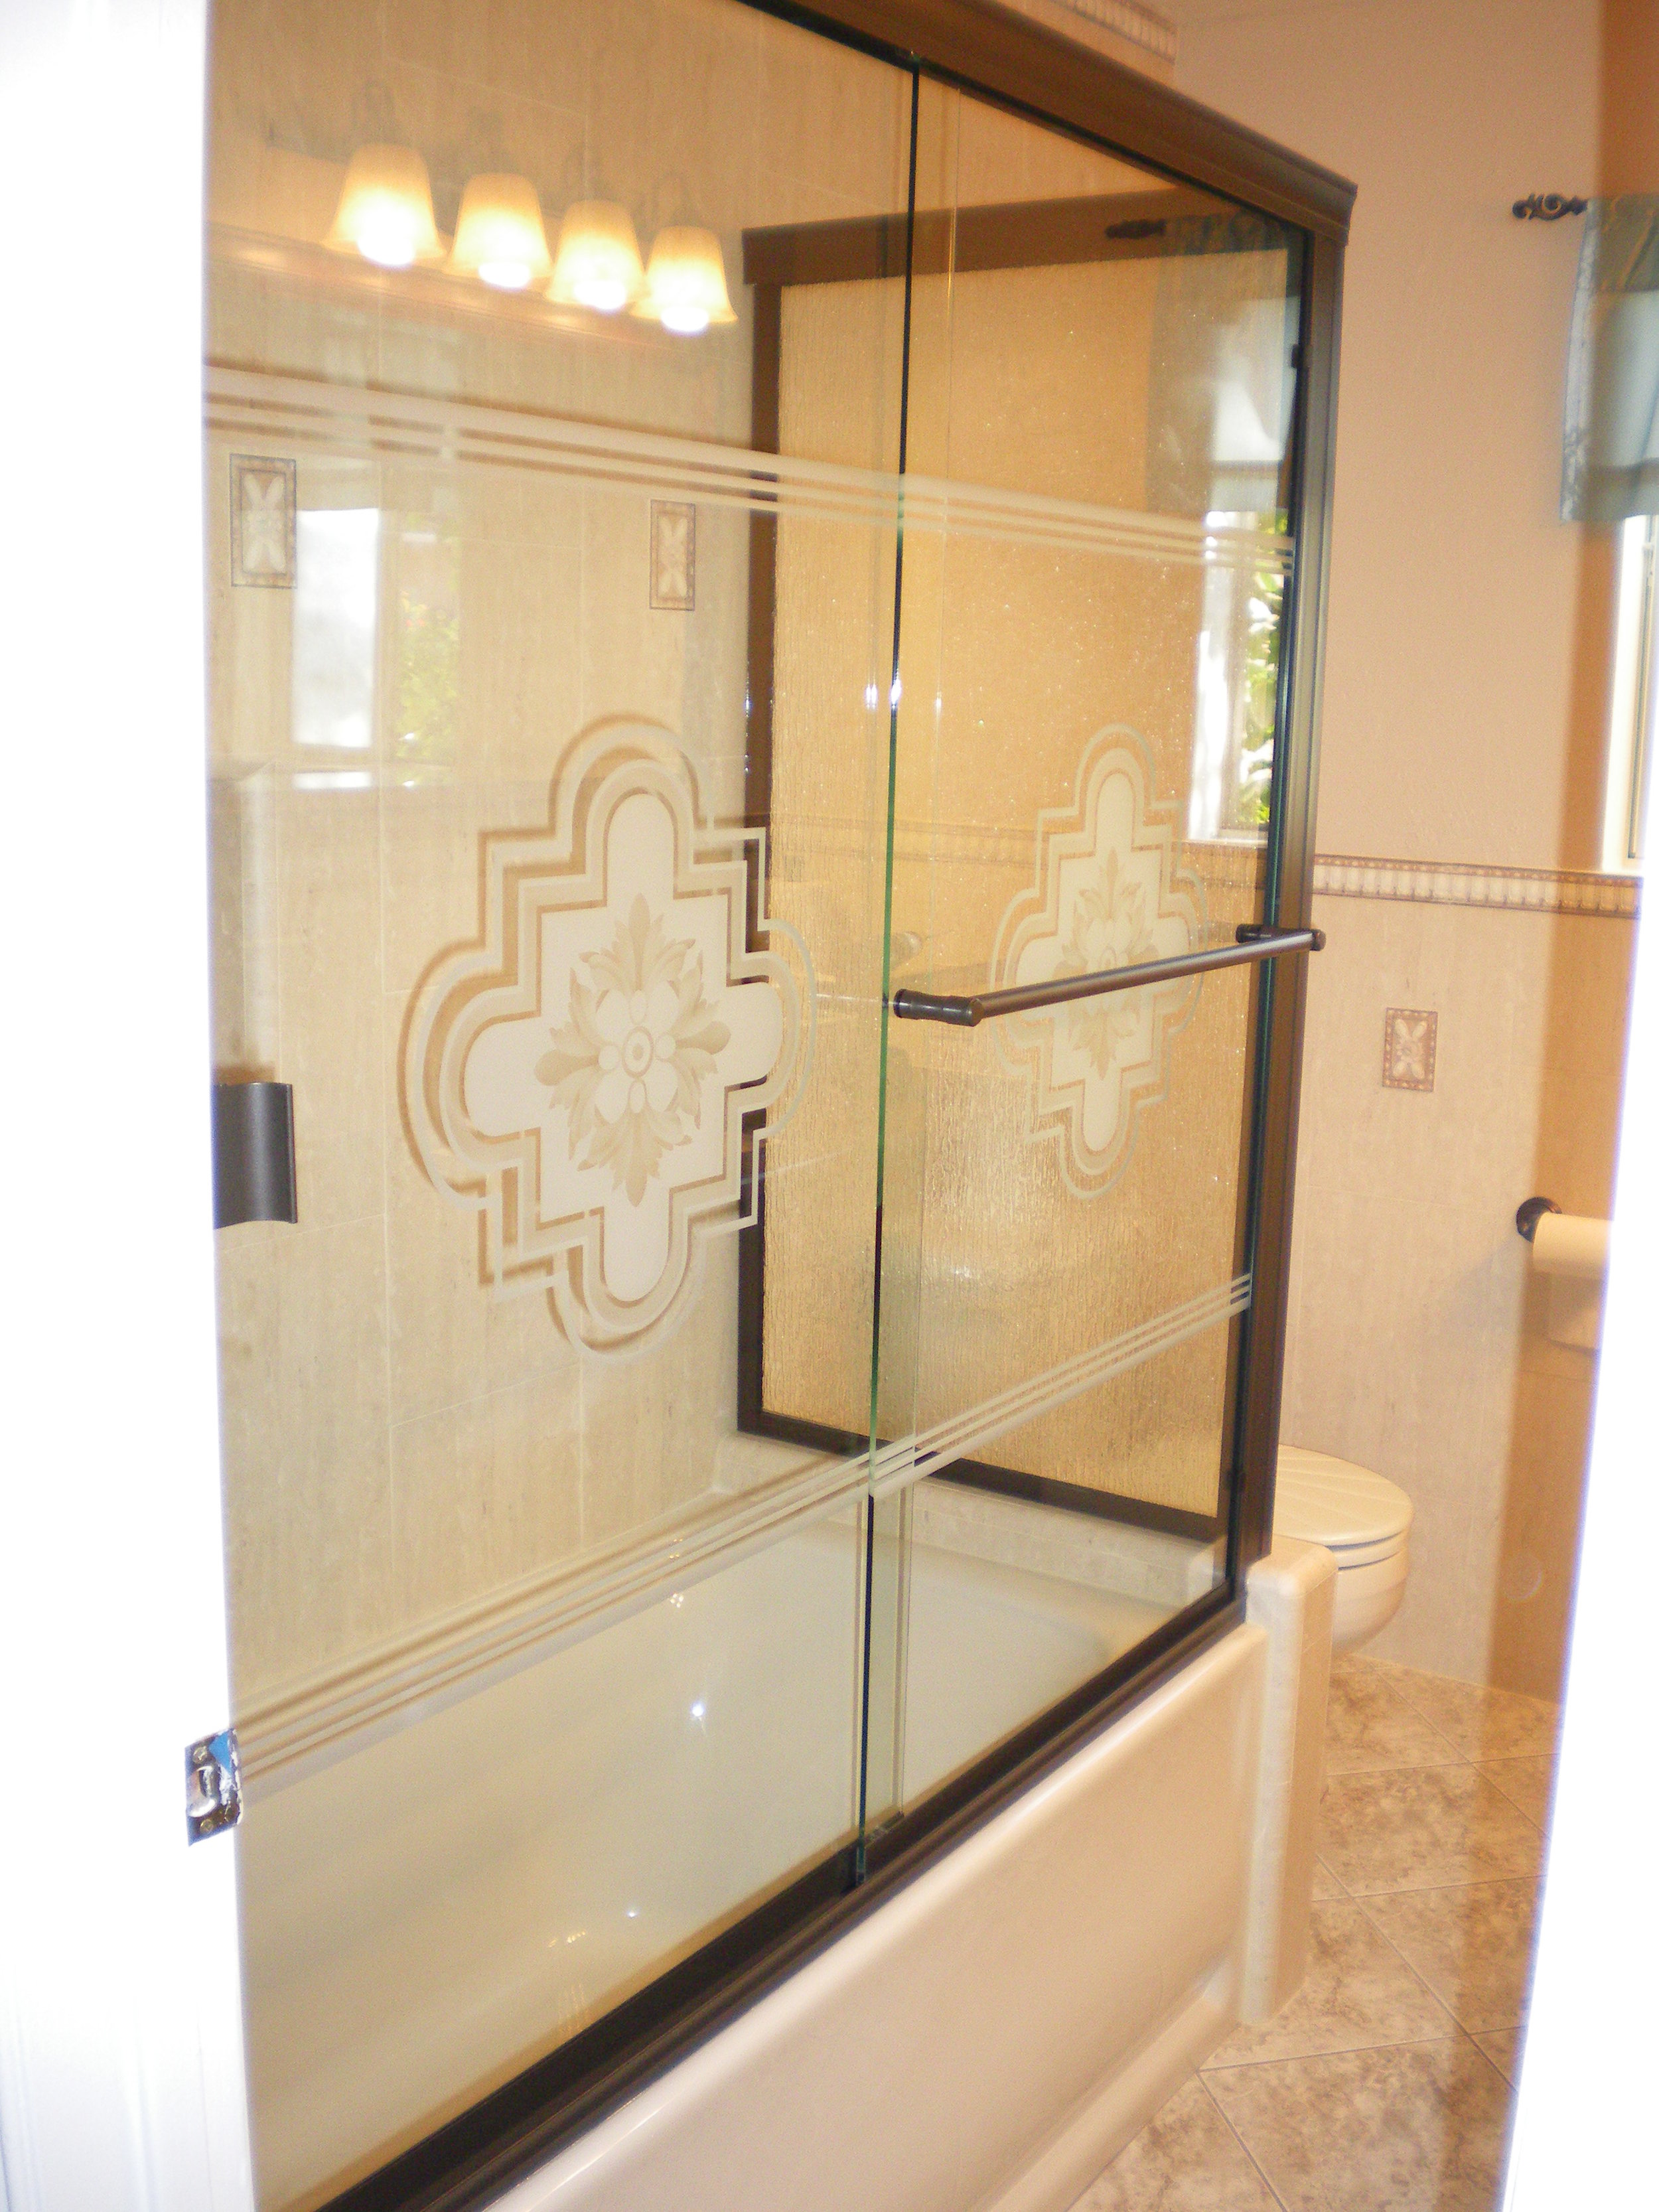 Shower-Doors-Residential-Photos-3.jpg